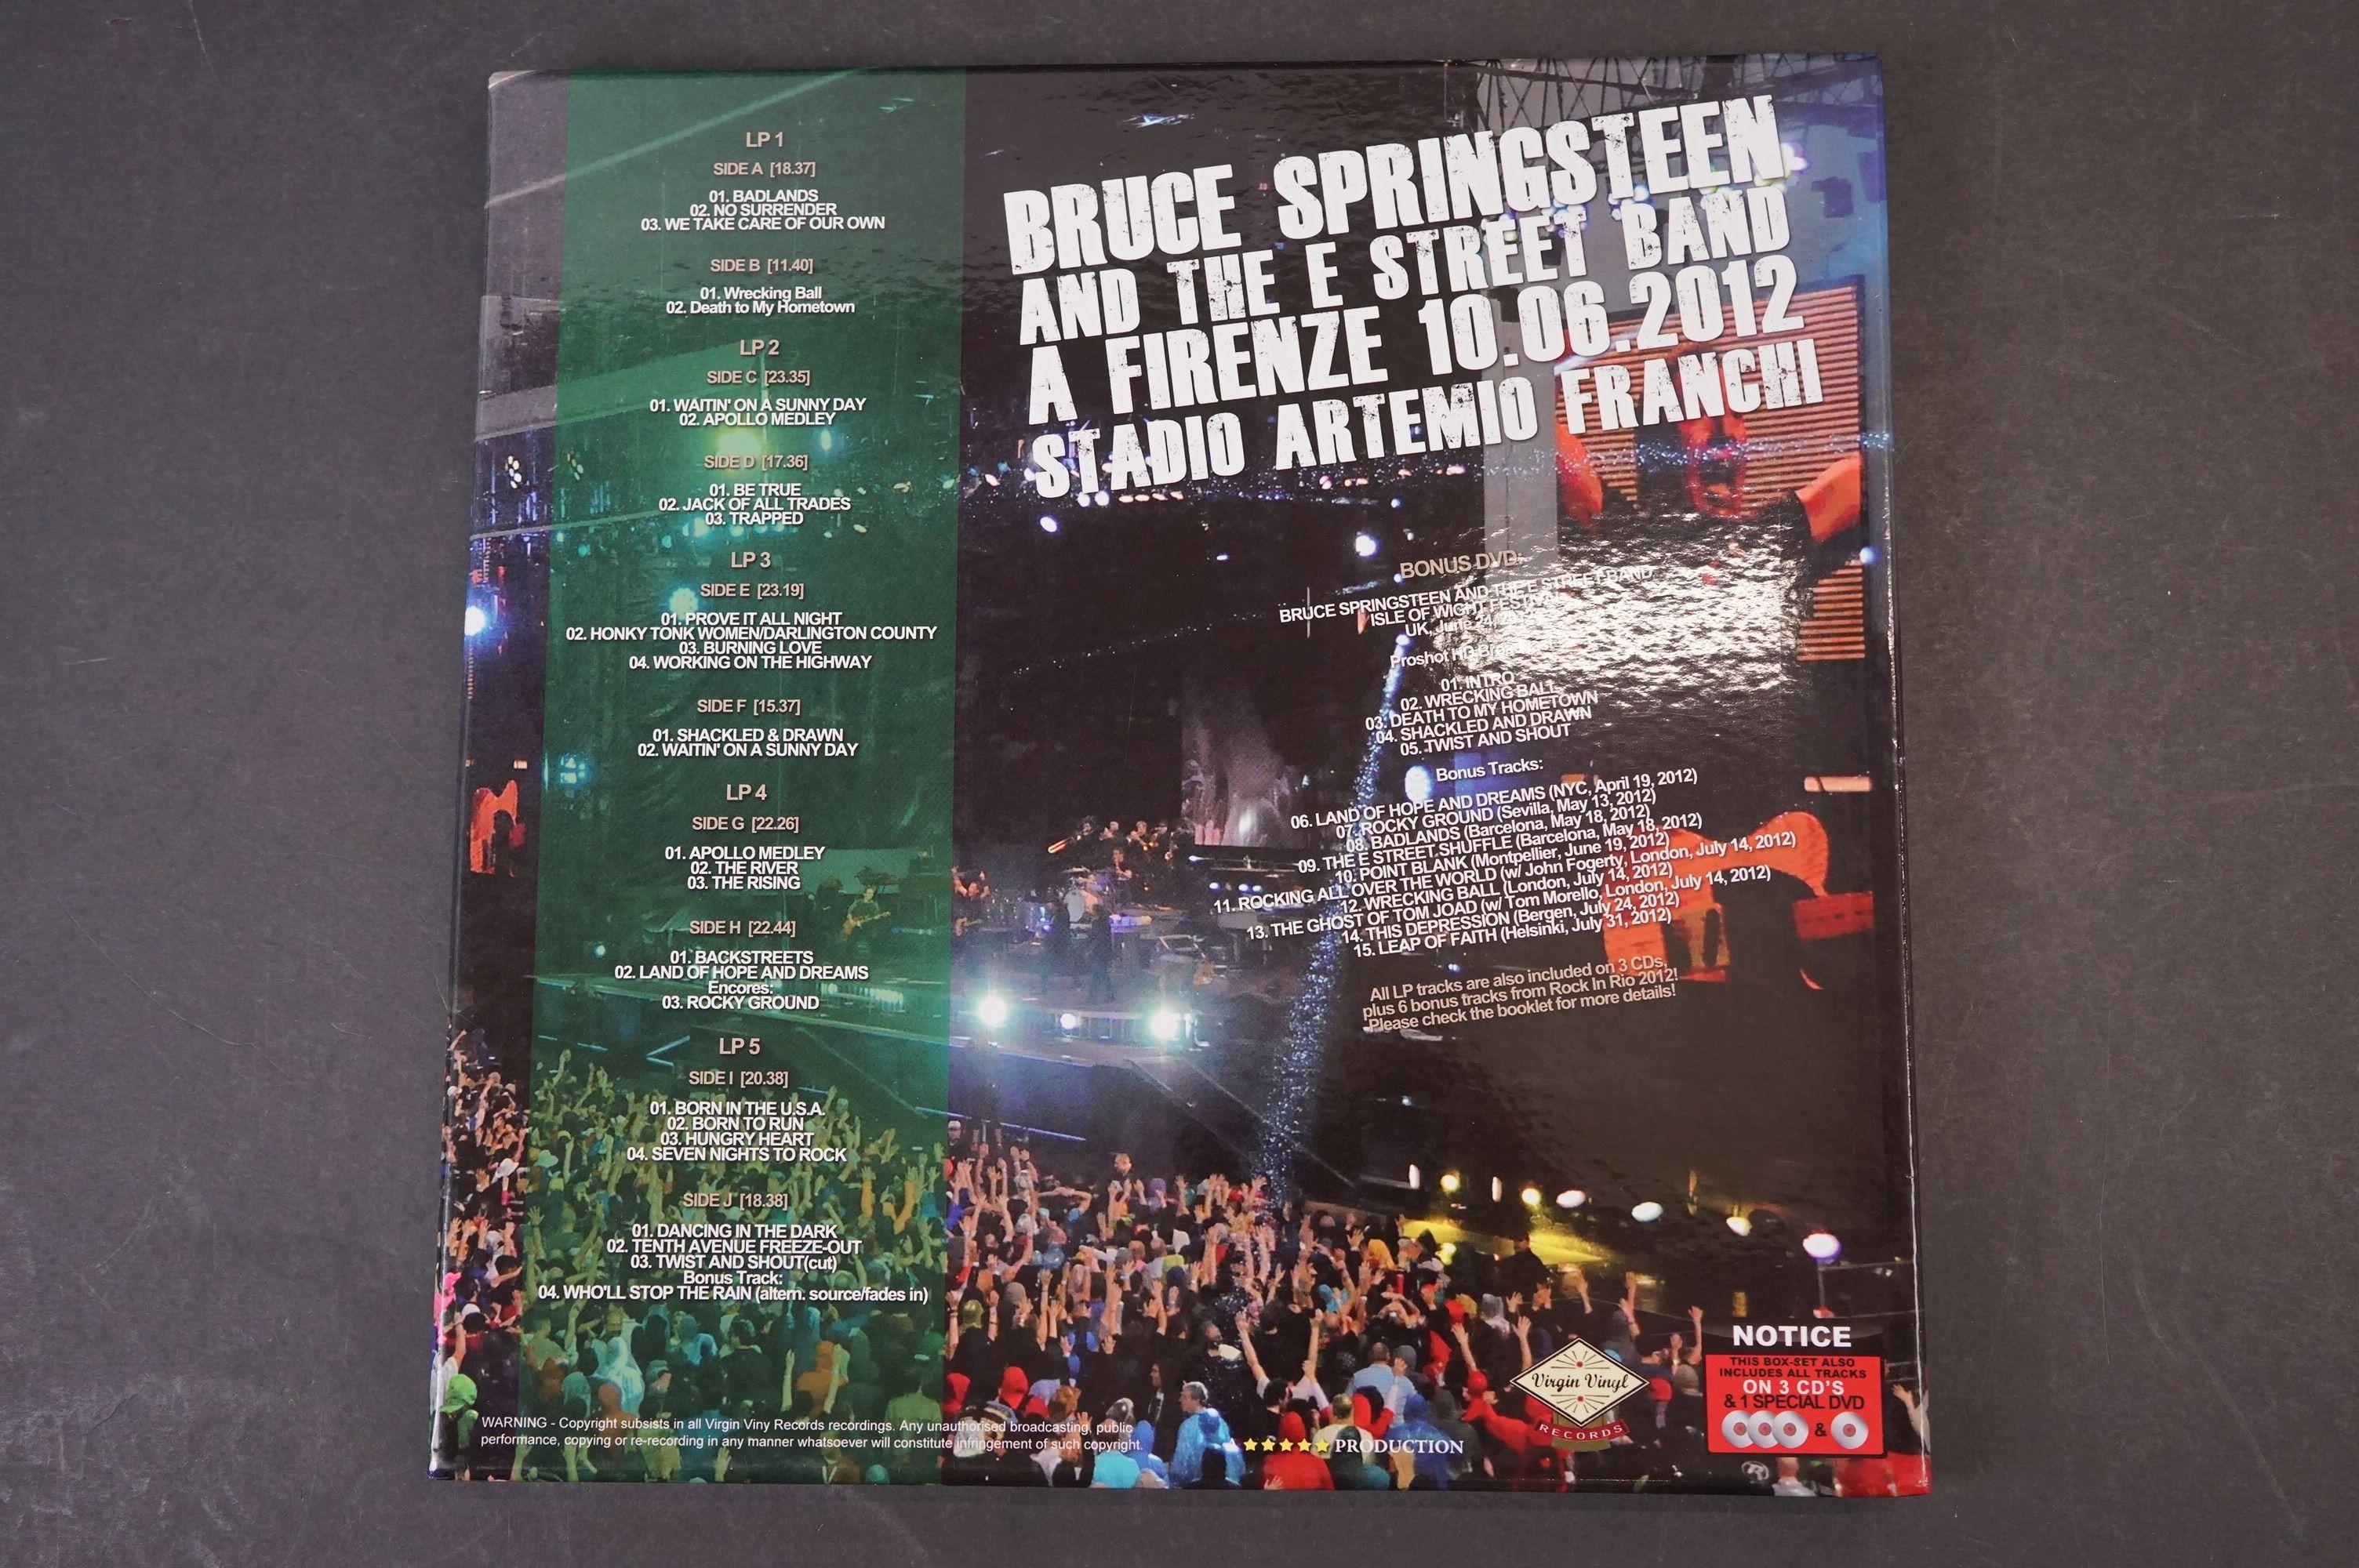 Vinyl - ltd edn Bruce Springsteen and The E Street Band A Firenze 10.06.2012 5 LP 3 CD 1 DVD heavy - Image 9 of 10